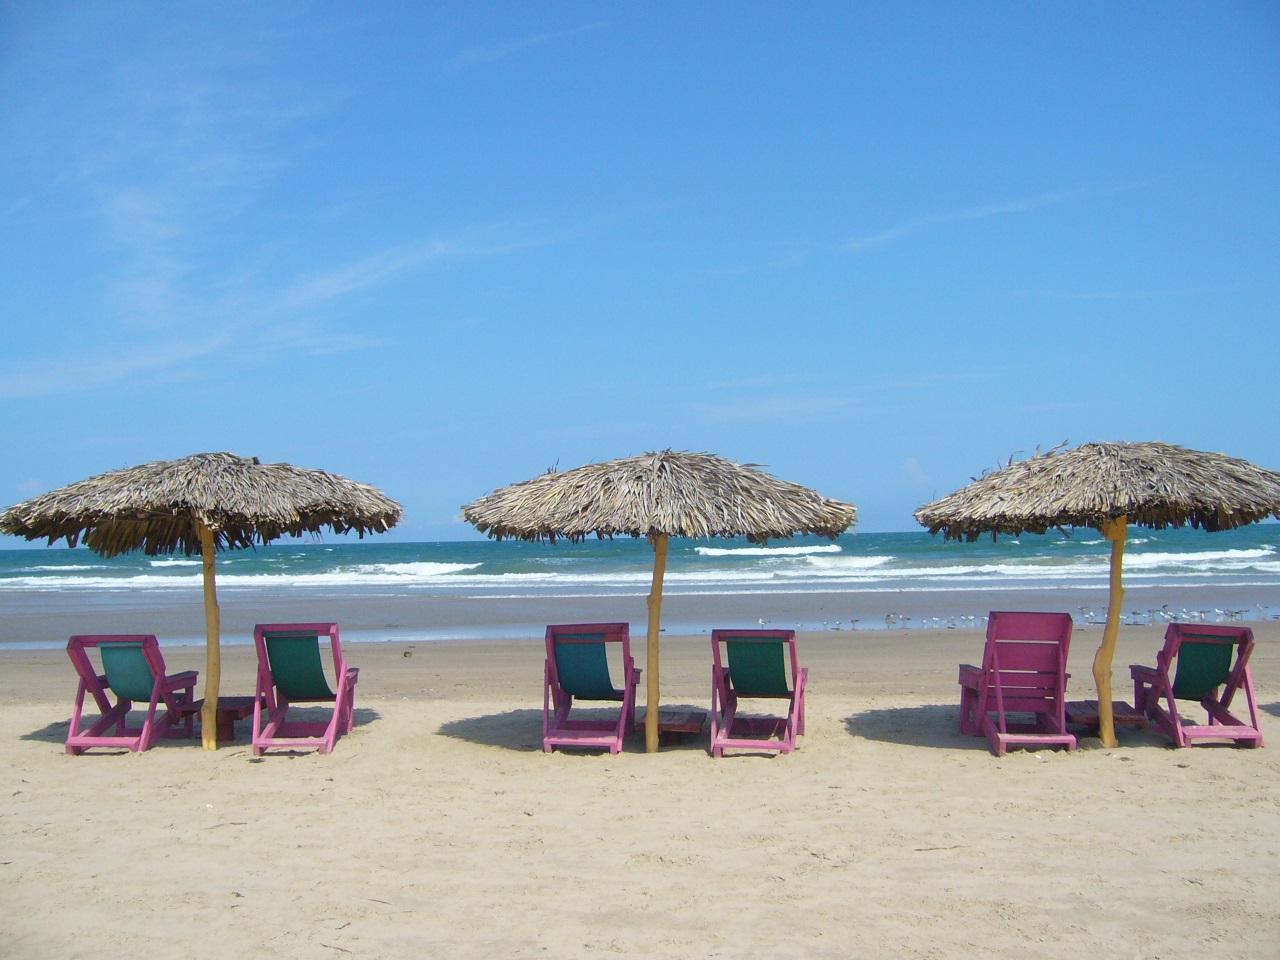 mare spiagge argentina